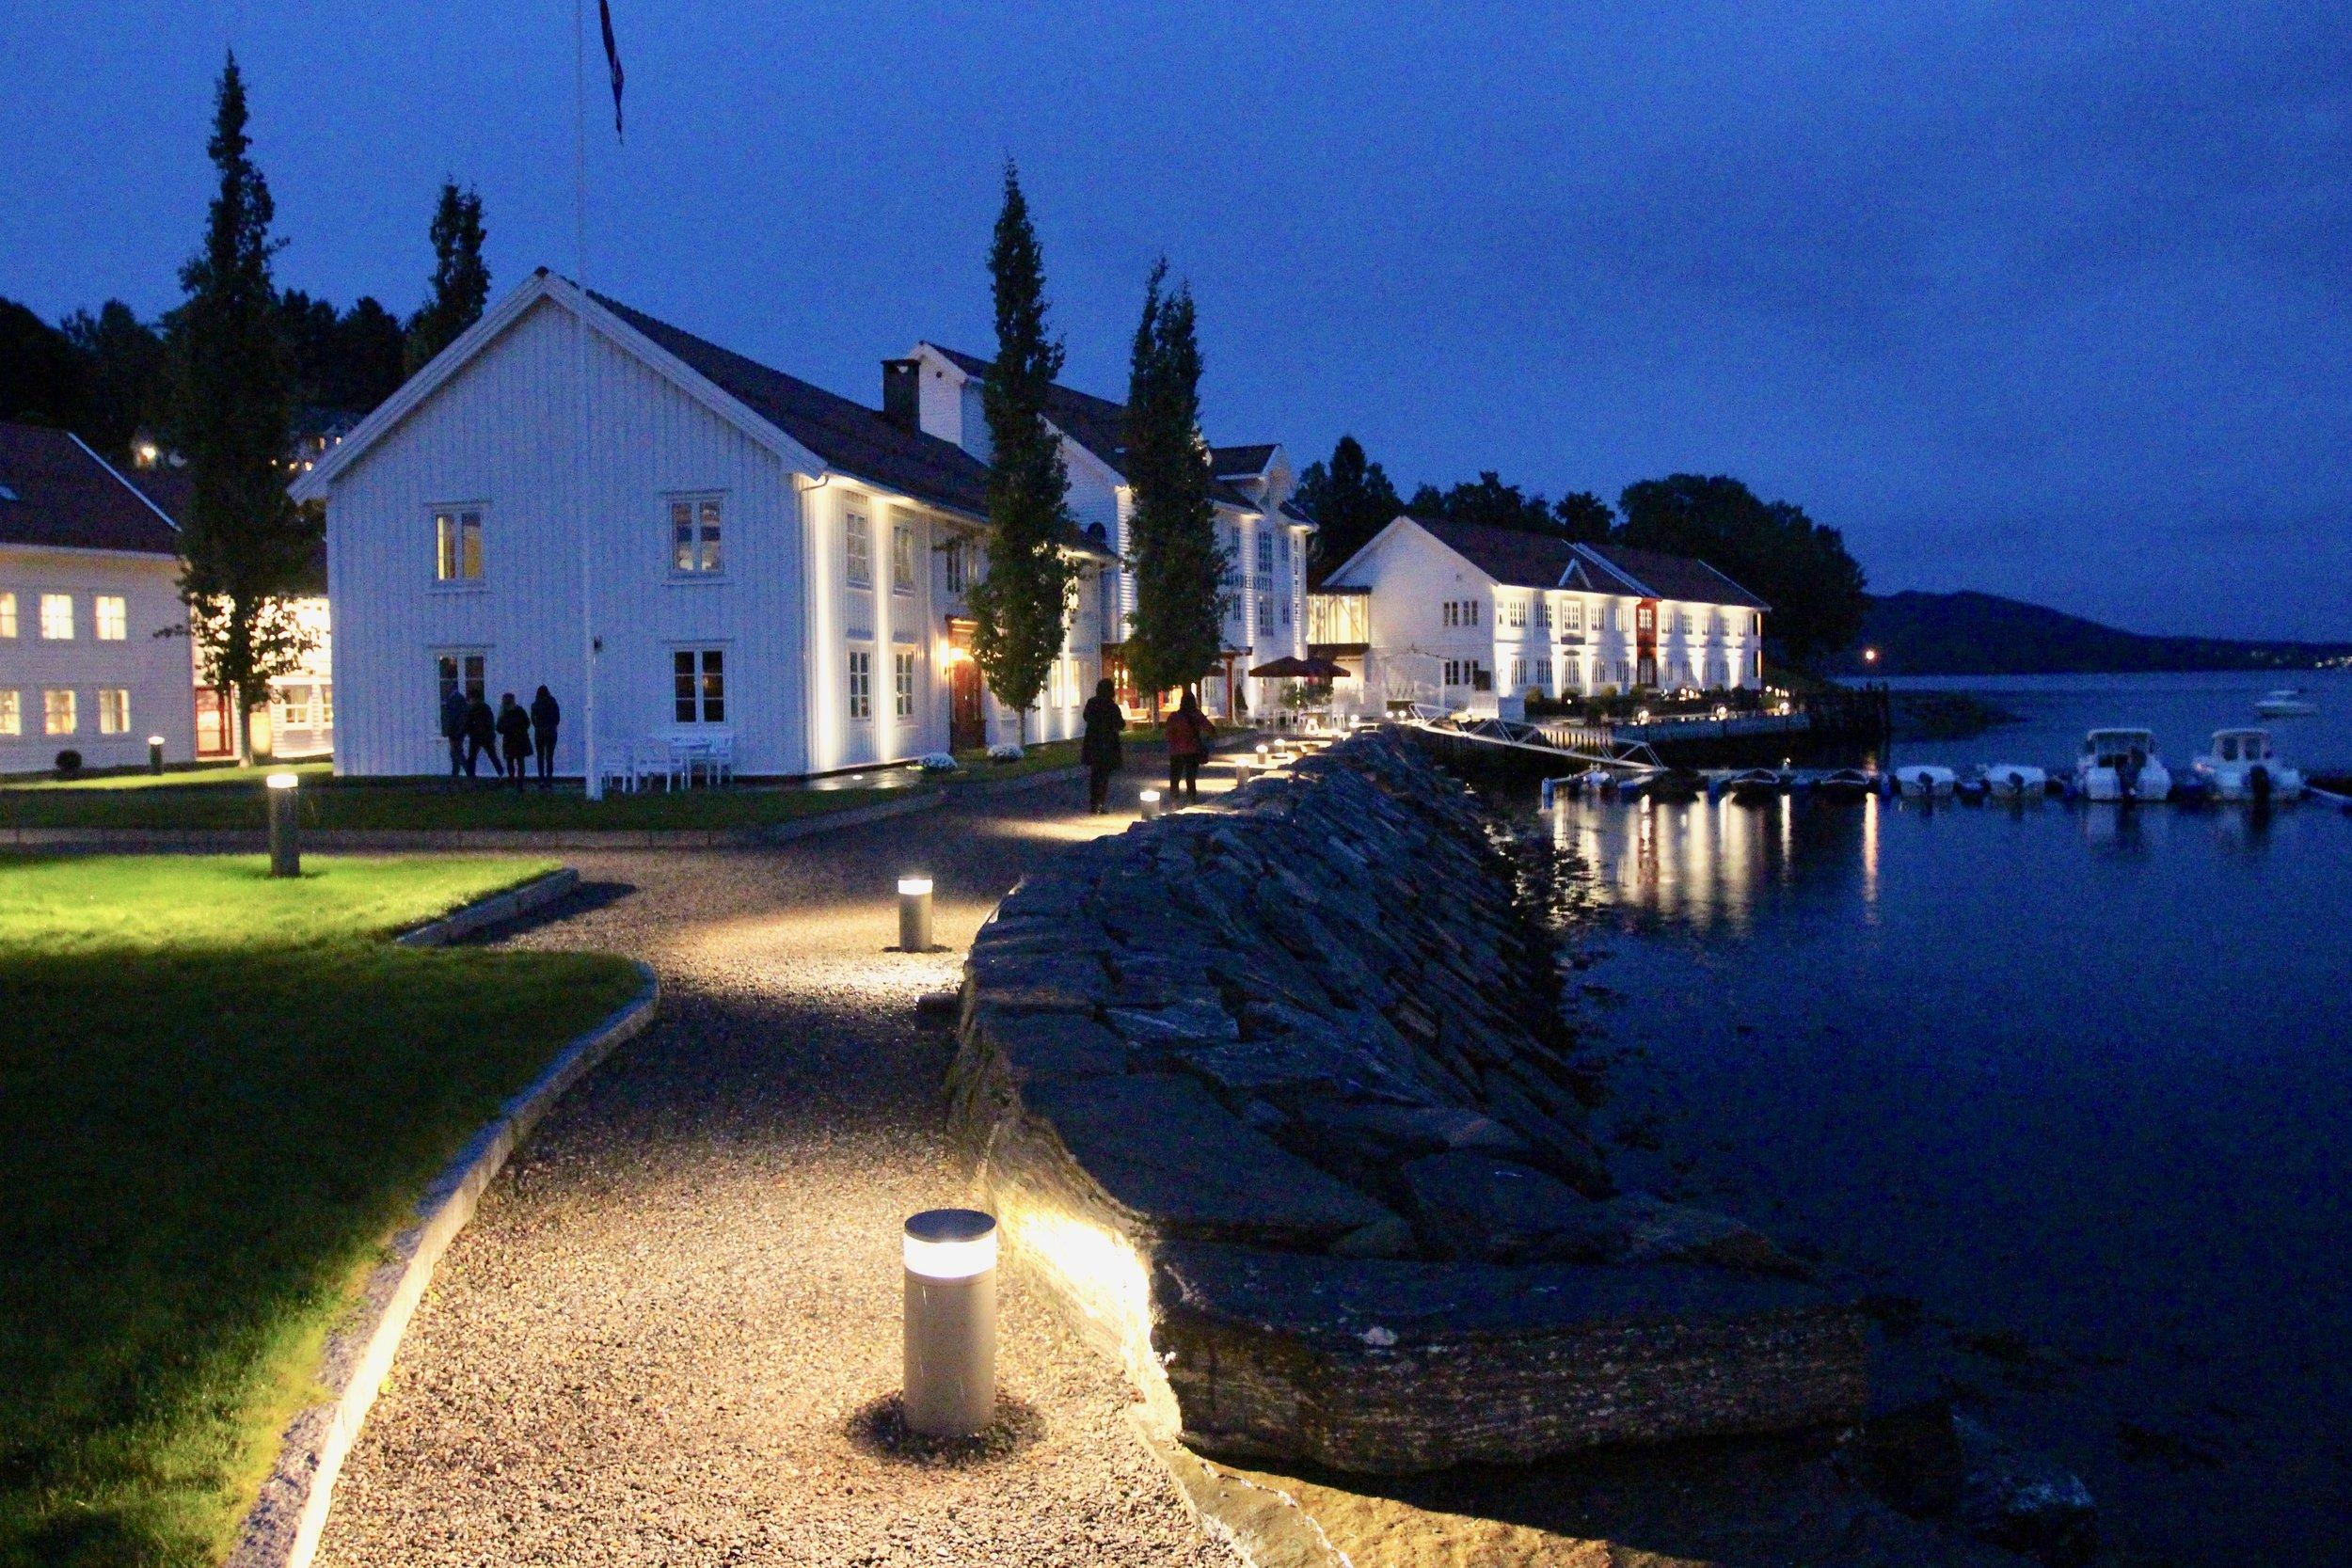 Angvik Gamle Handelssted ligger mellom Molde og Kristiansund og er en perle ved Tingvollfjorden. Foto: Odd Roar Lange